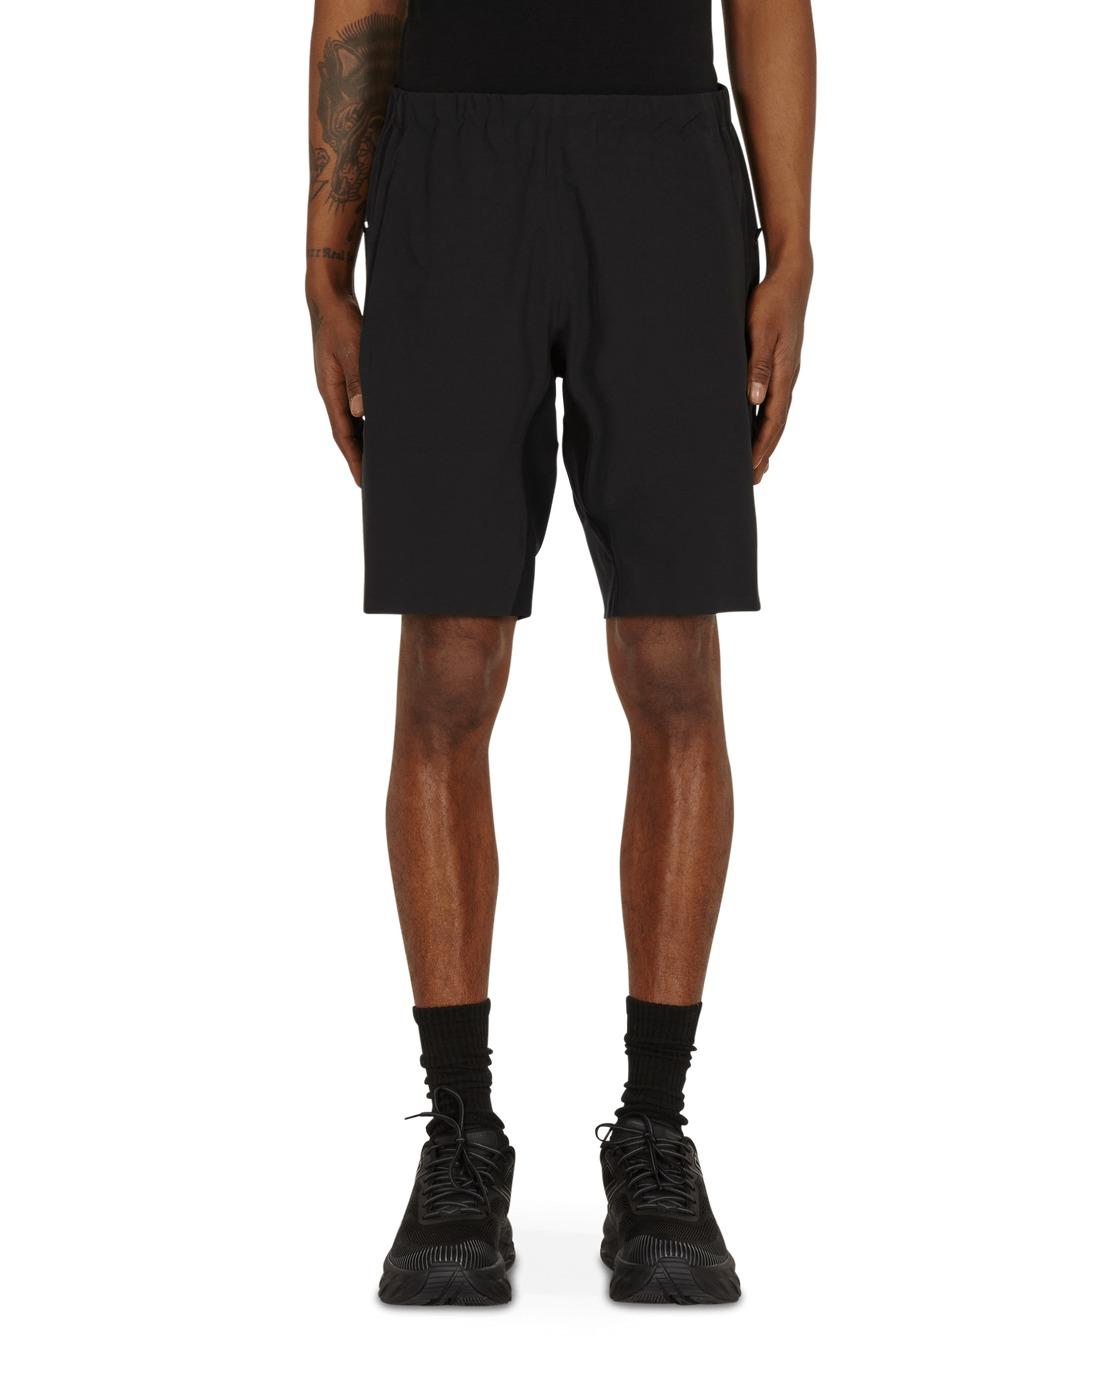 Arc'teryx Veilance Secant Comp Shorts Black